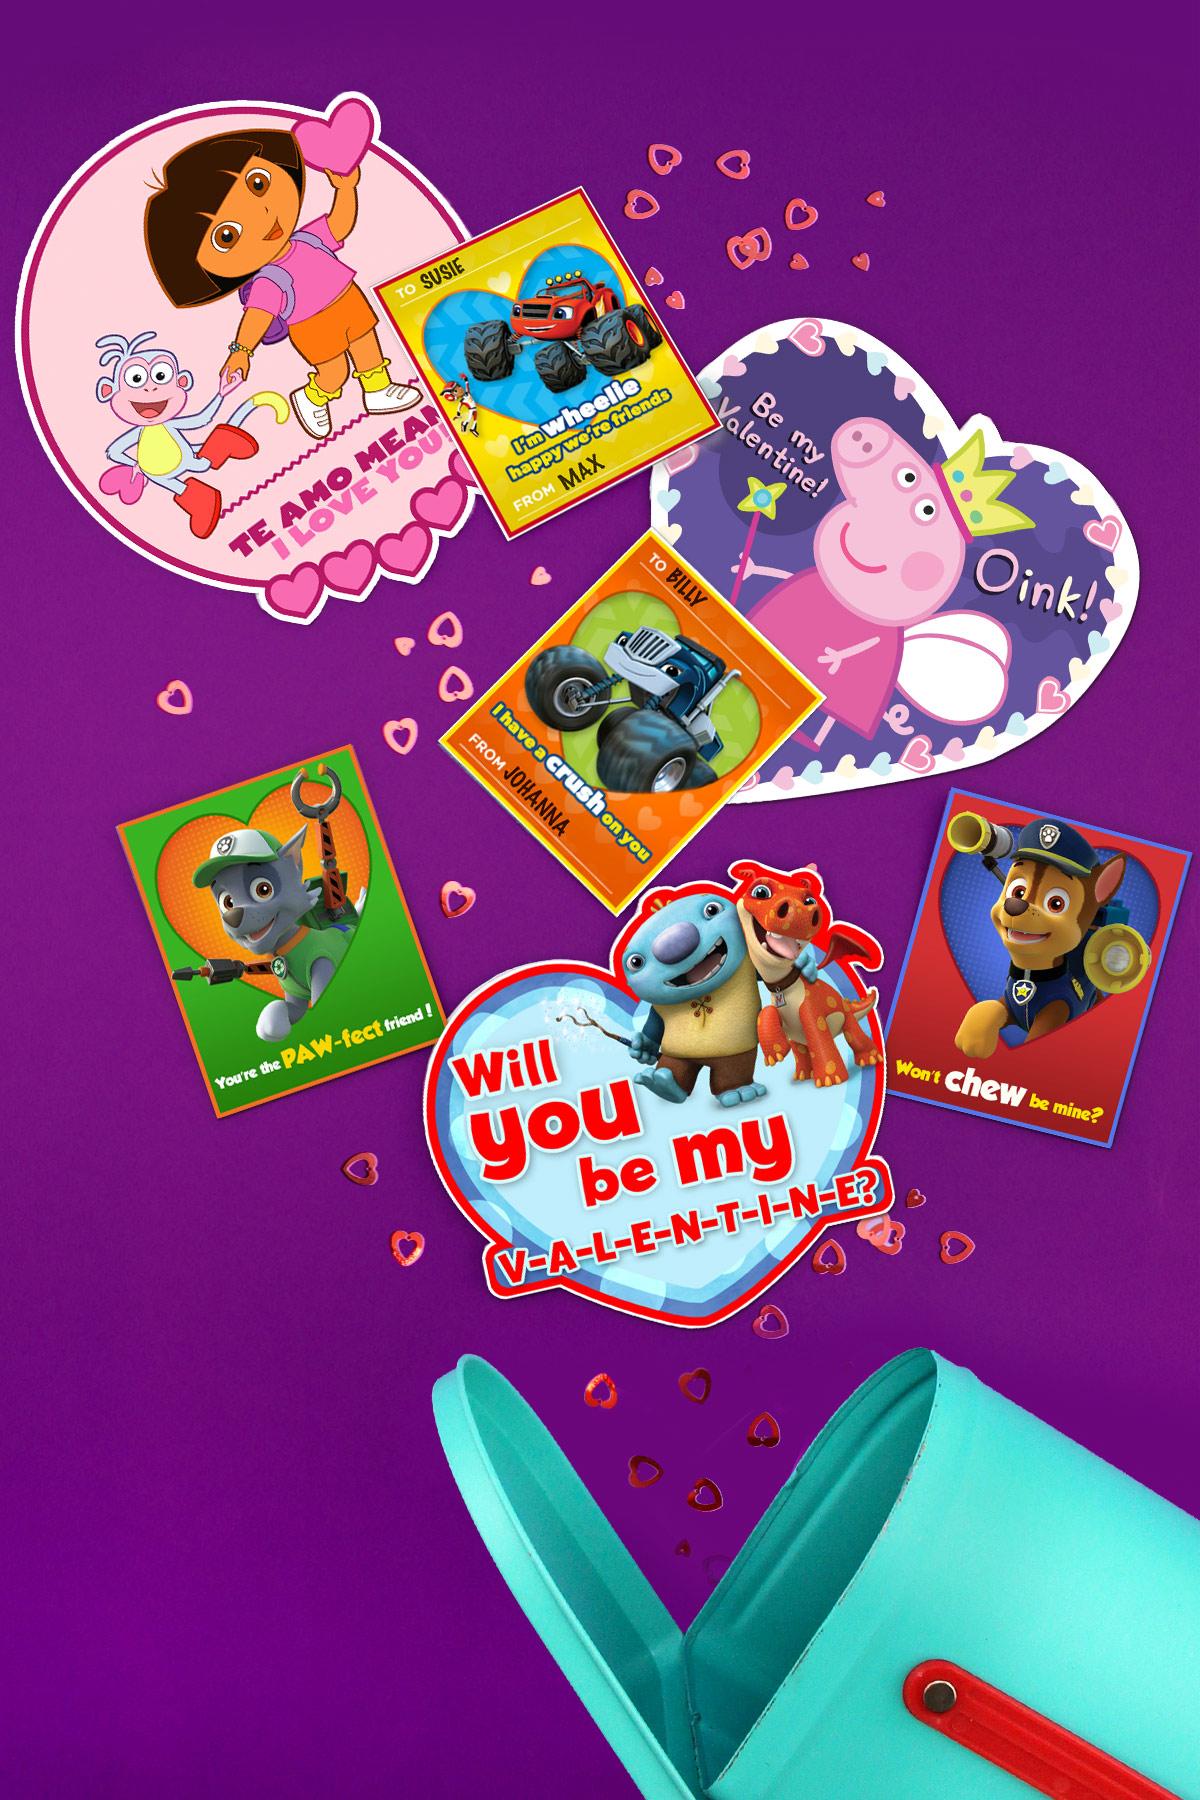 8 Cute Diy Nick Jr Valentine S Day Cards